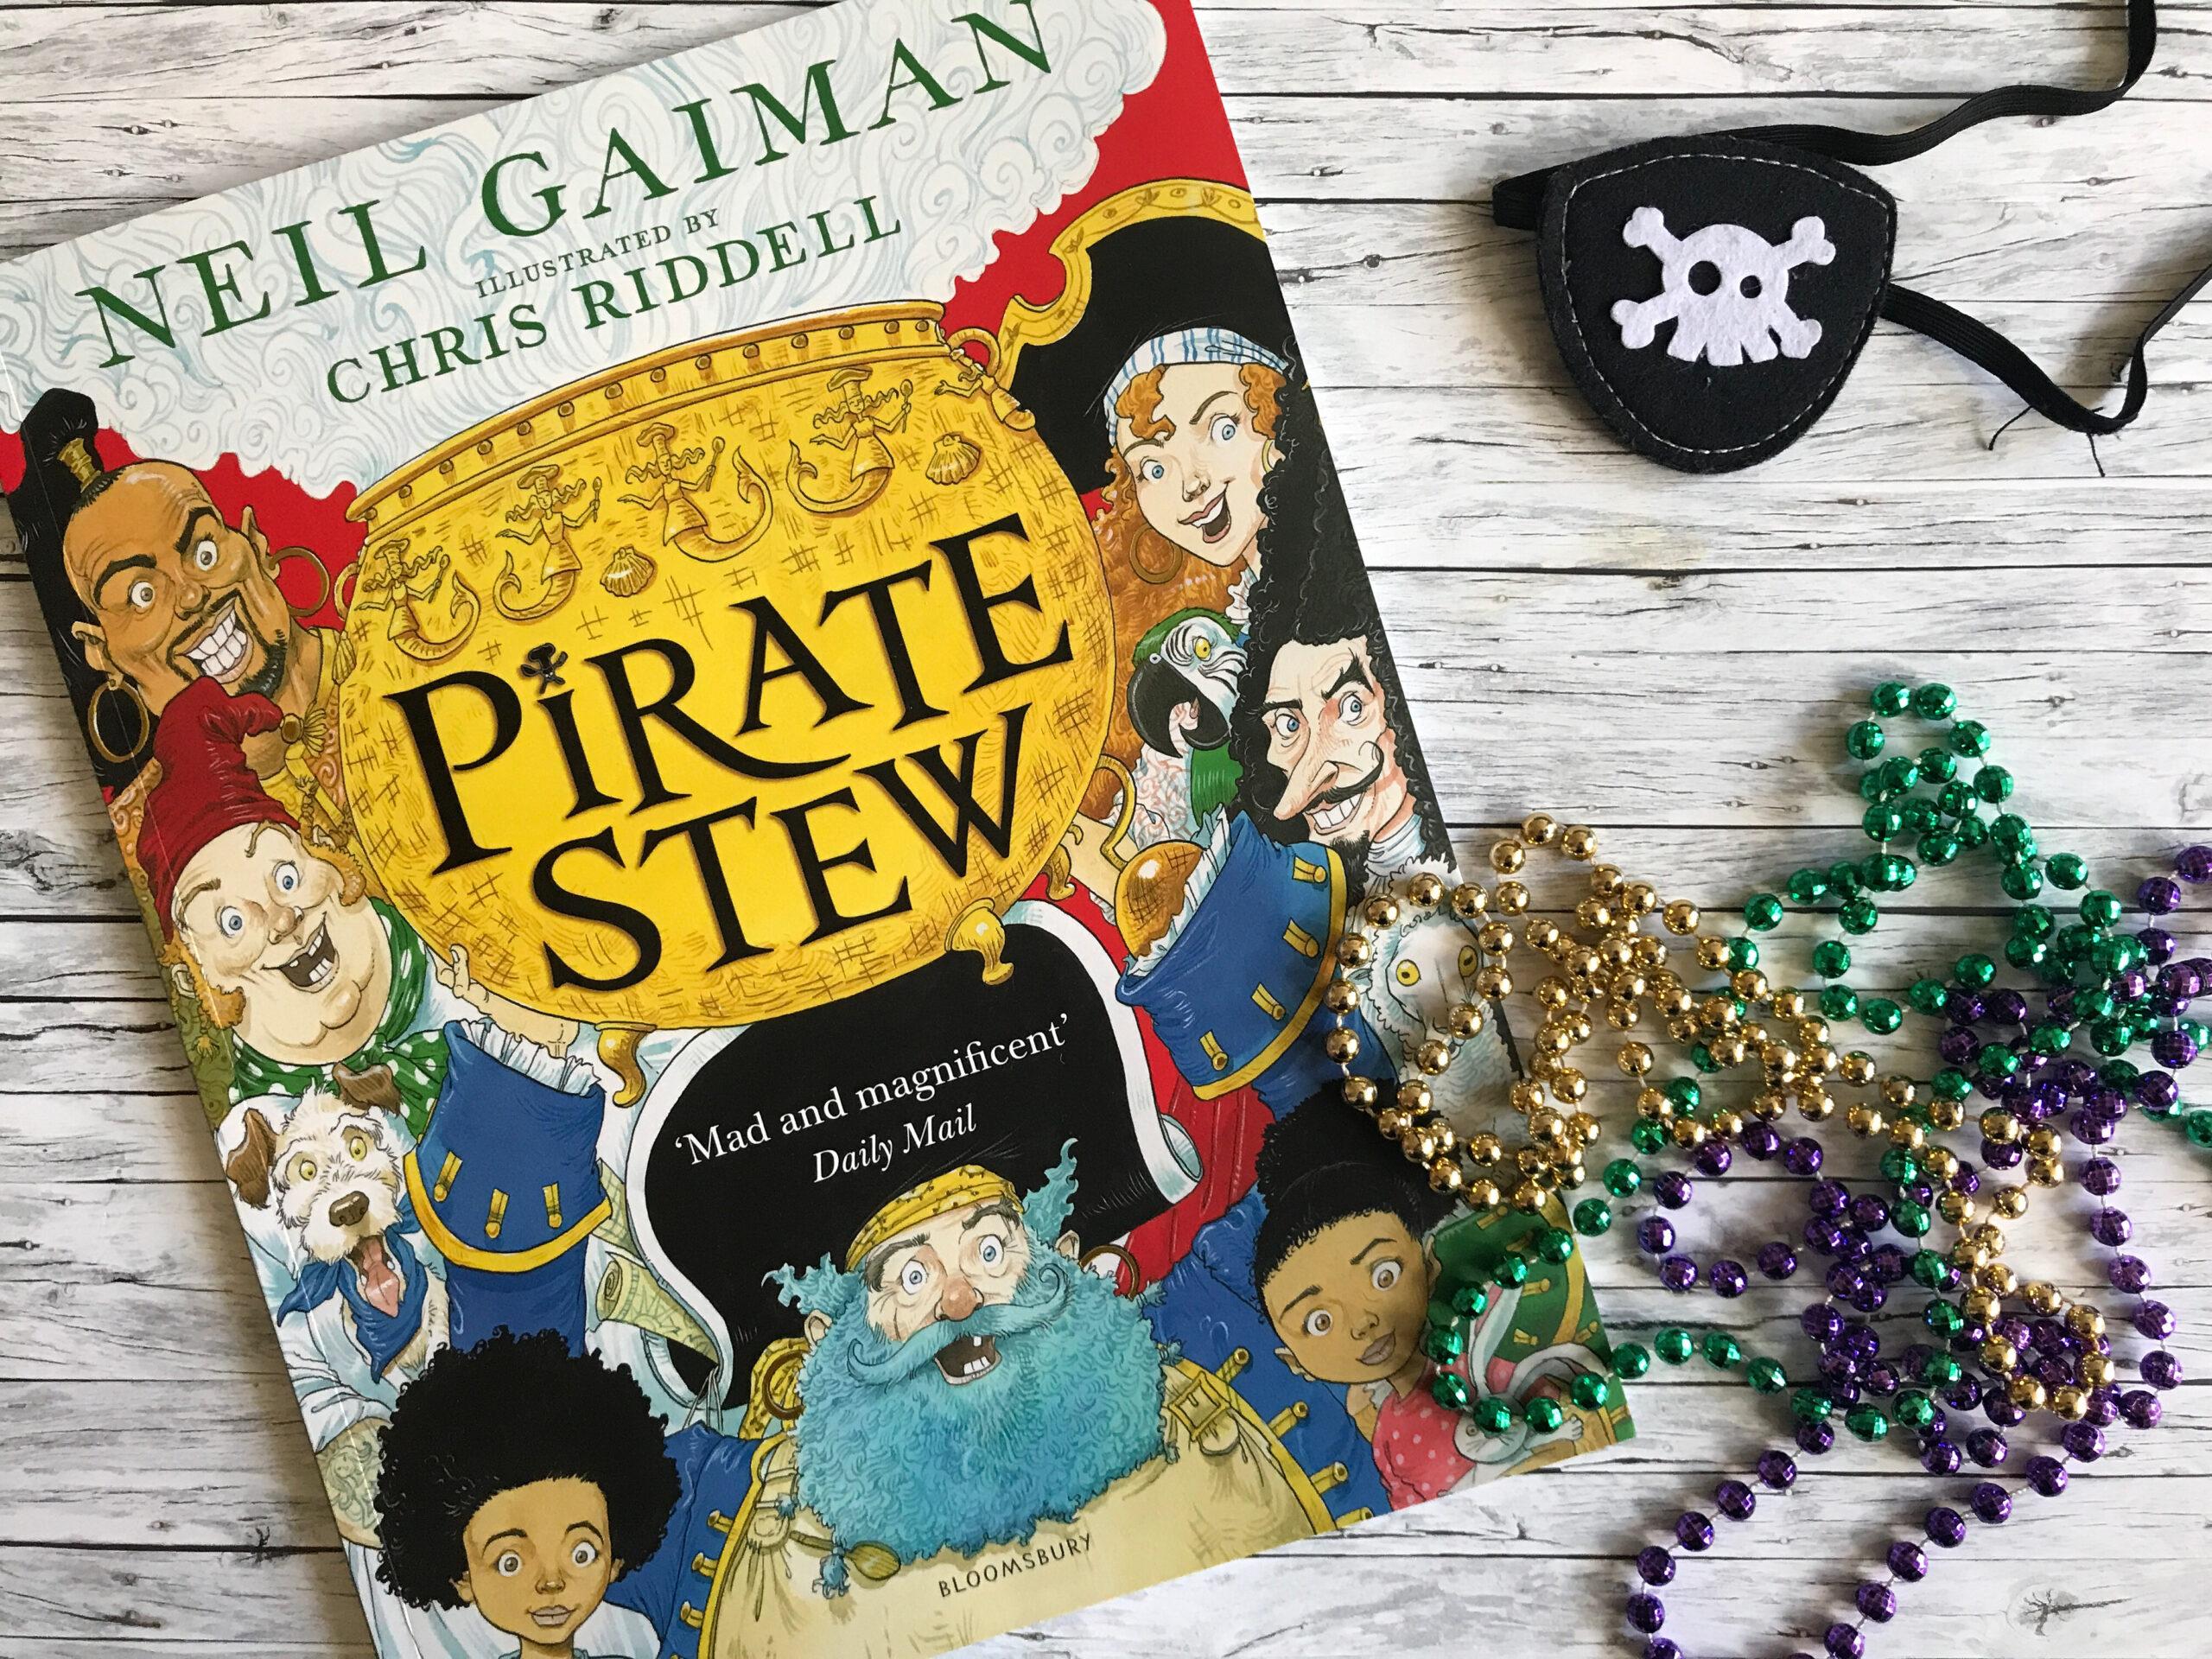 Pirate Stew Review Neil Gaiman